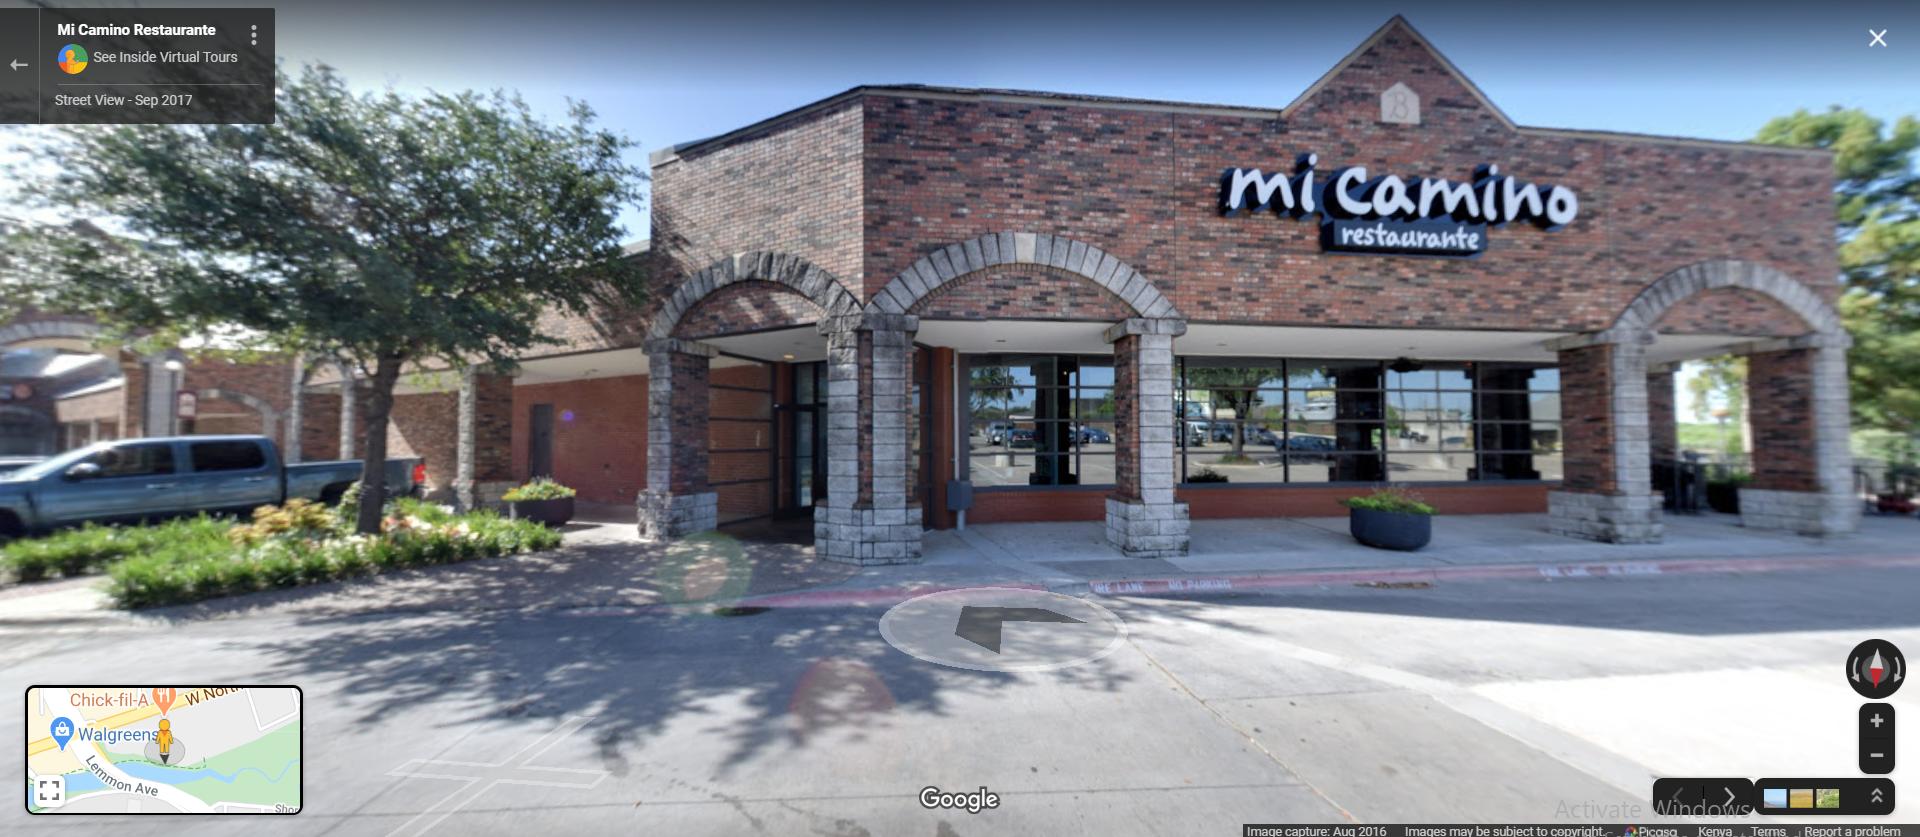 Mi Camino Restaurante - Dallas, TX